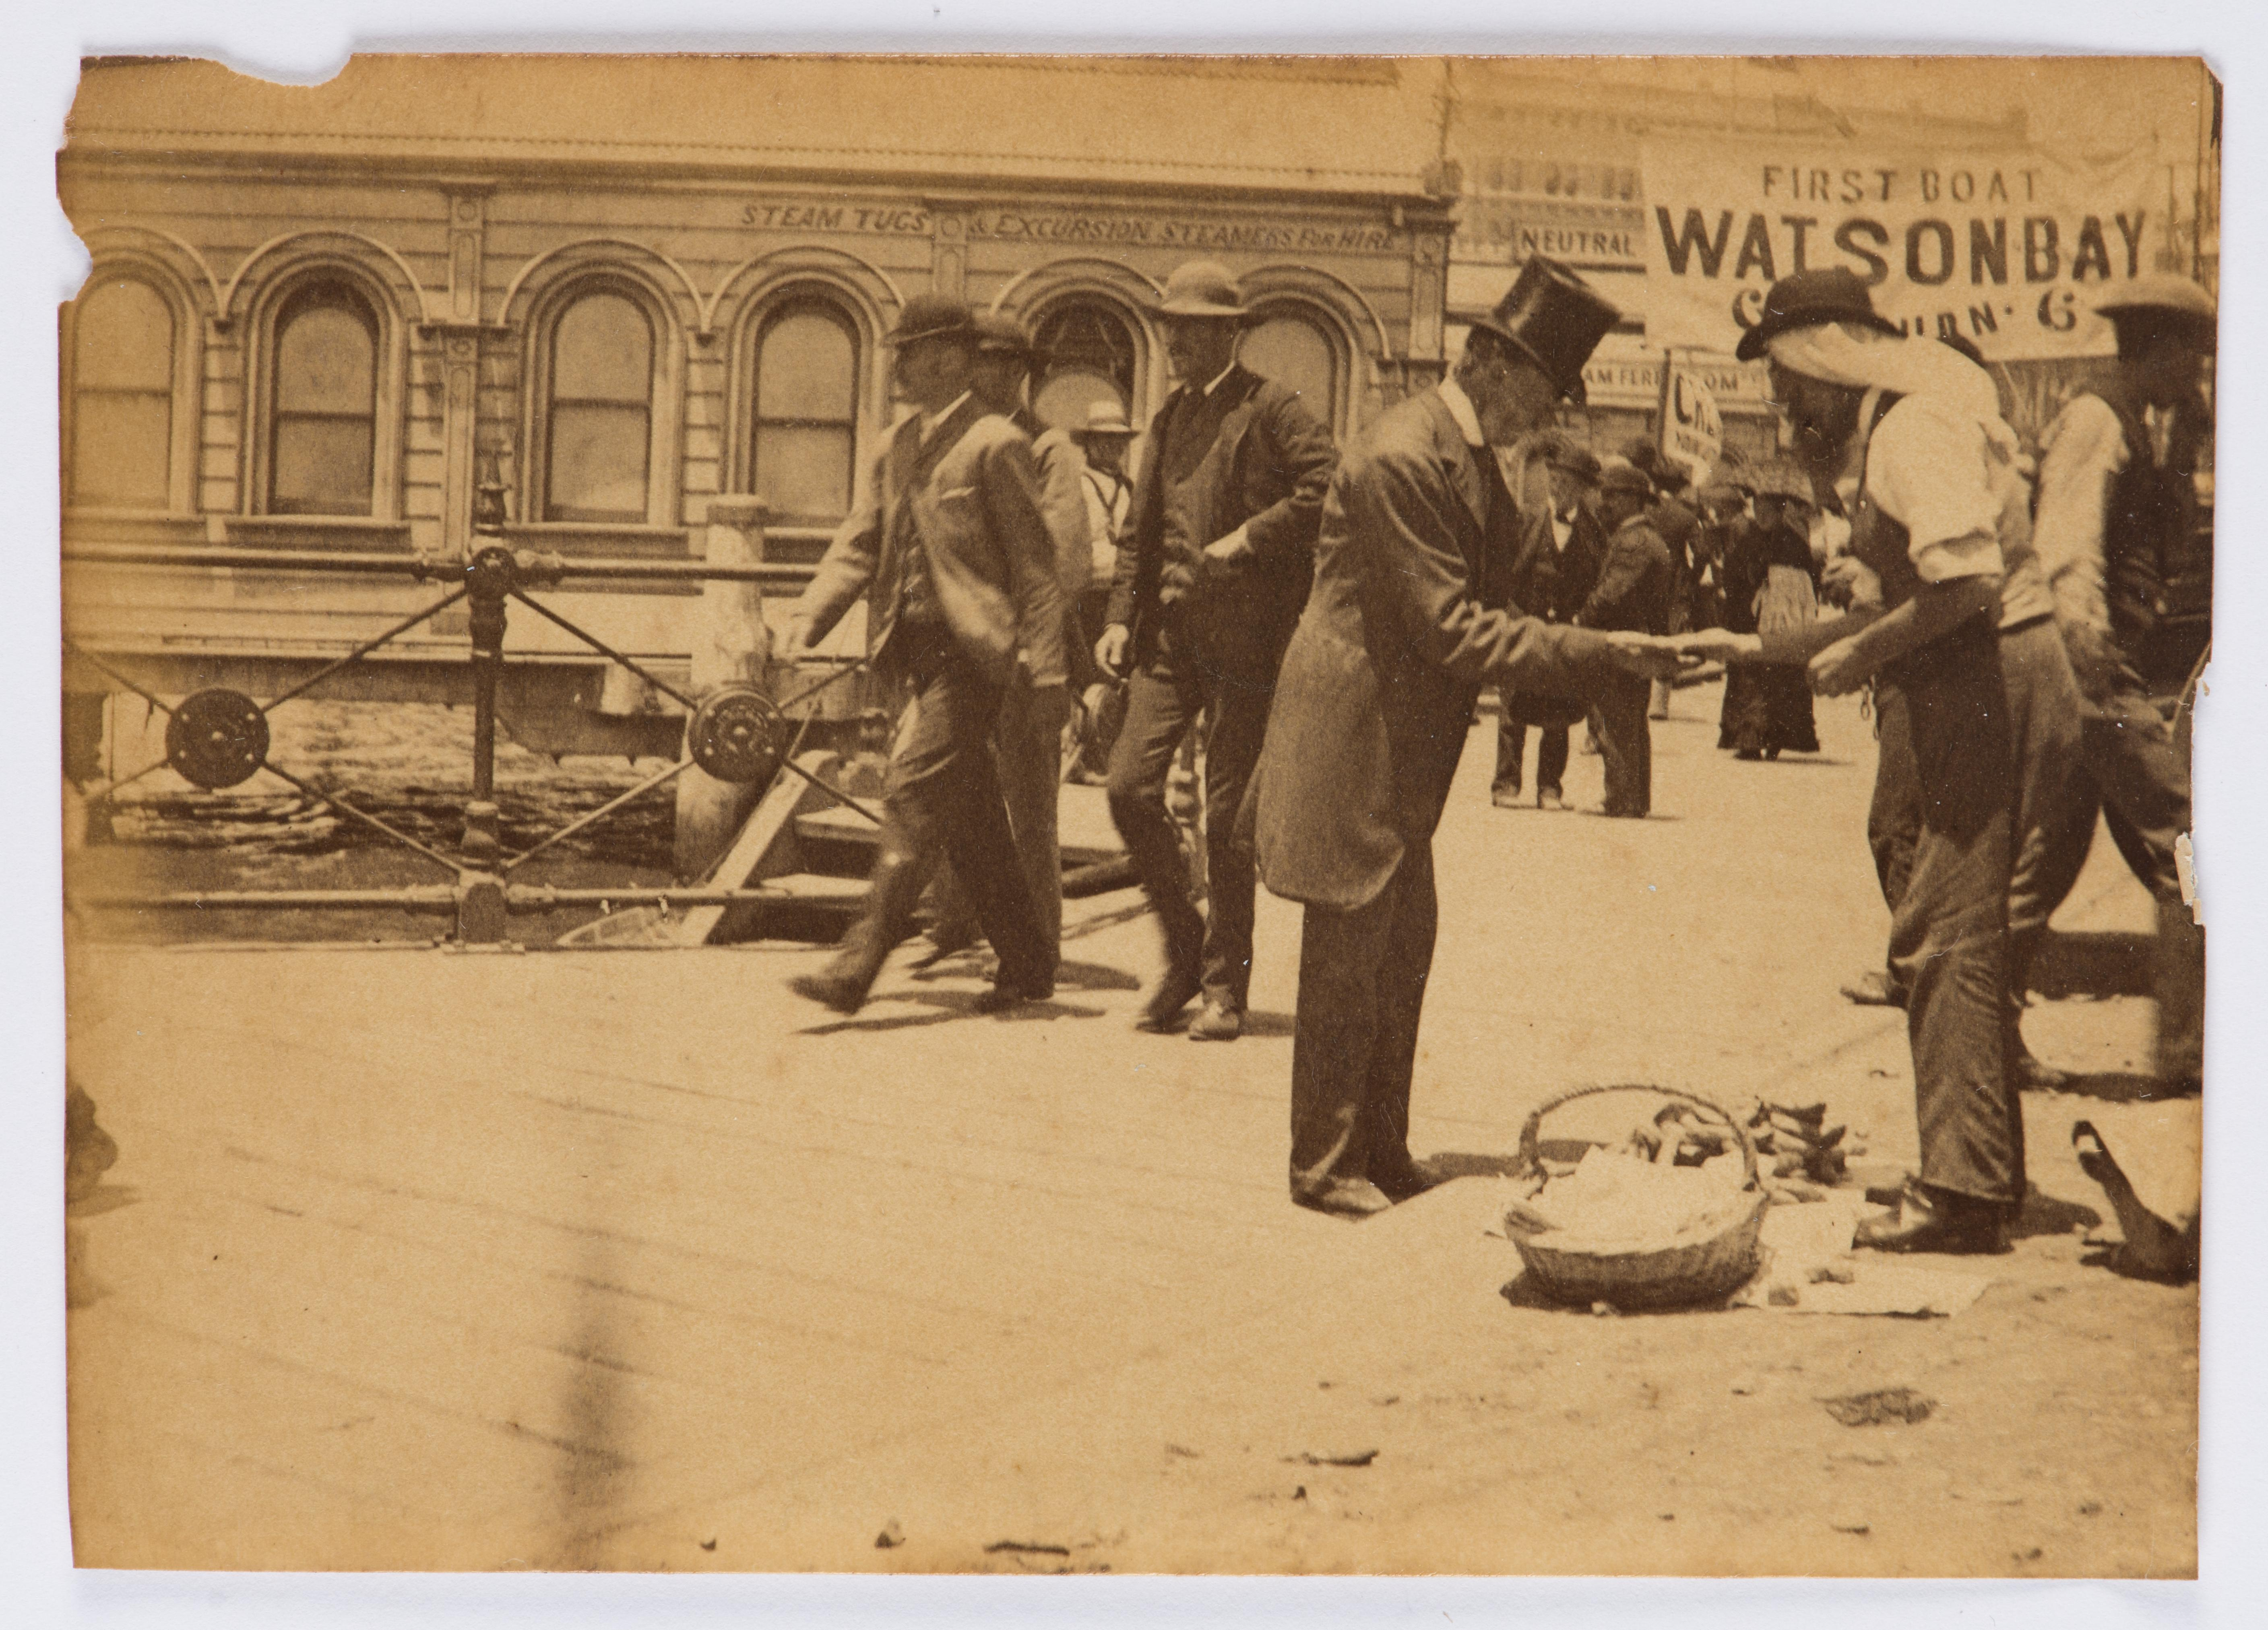 [Gentleman paying street merchant],  ca. 1880s-1900